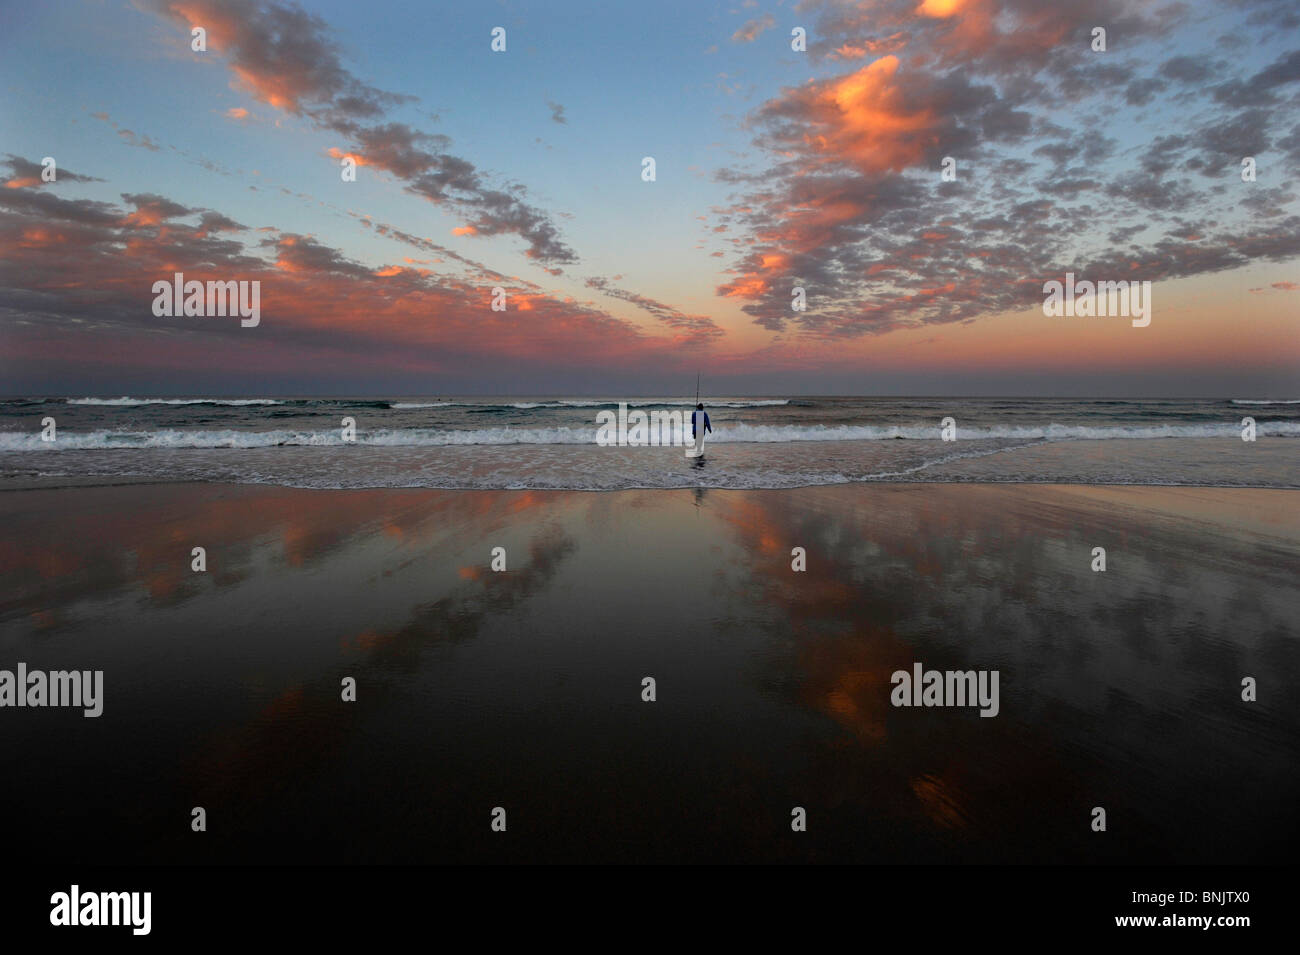 Fishing the Australian coast at sunset - Stock Image